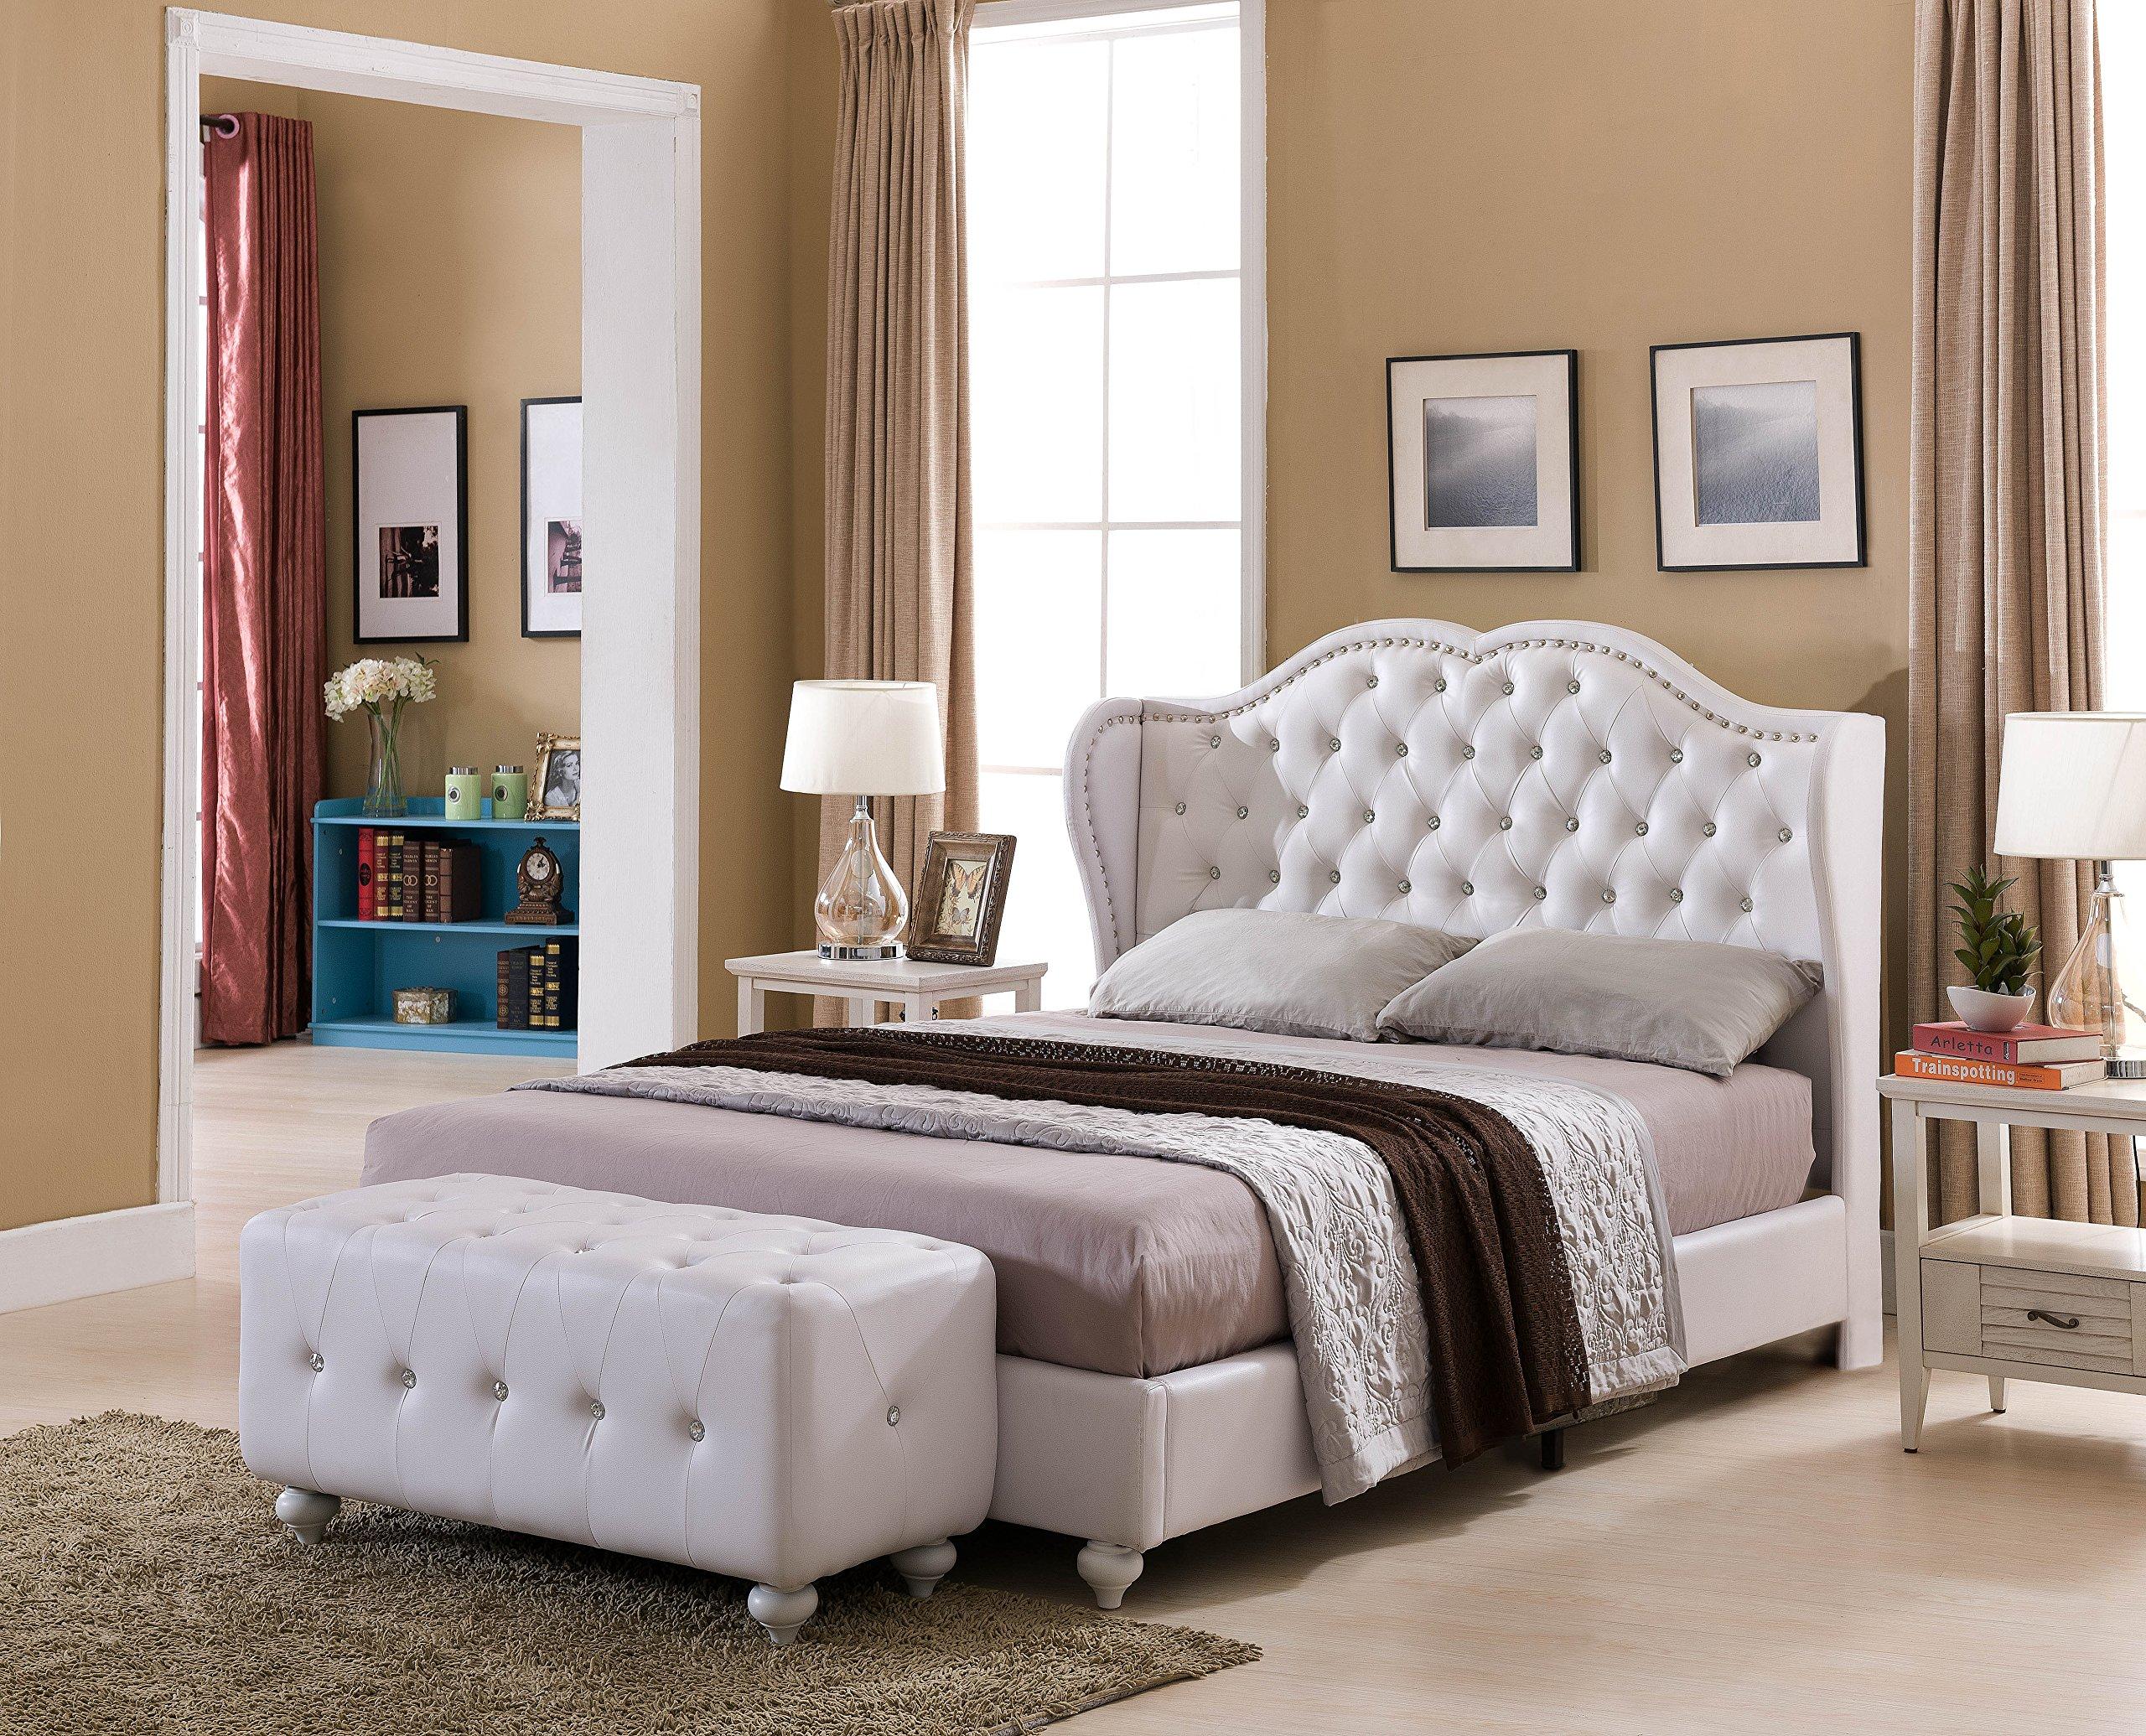 White King Size Bed Frame Amazoncom - White-king-bed-frame